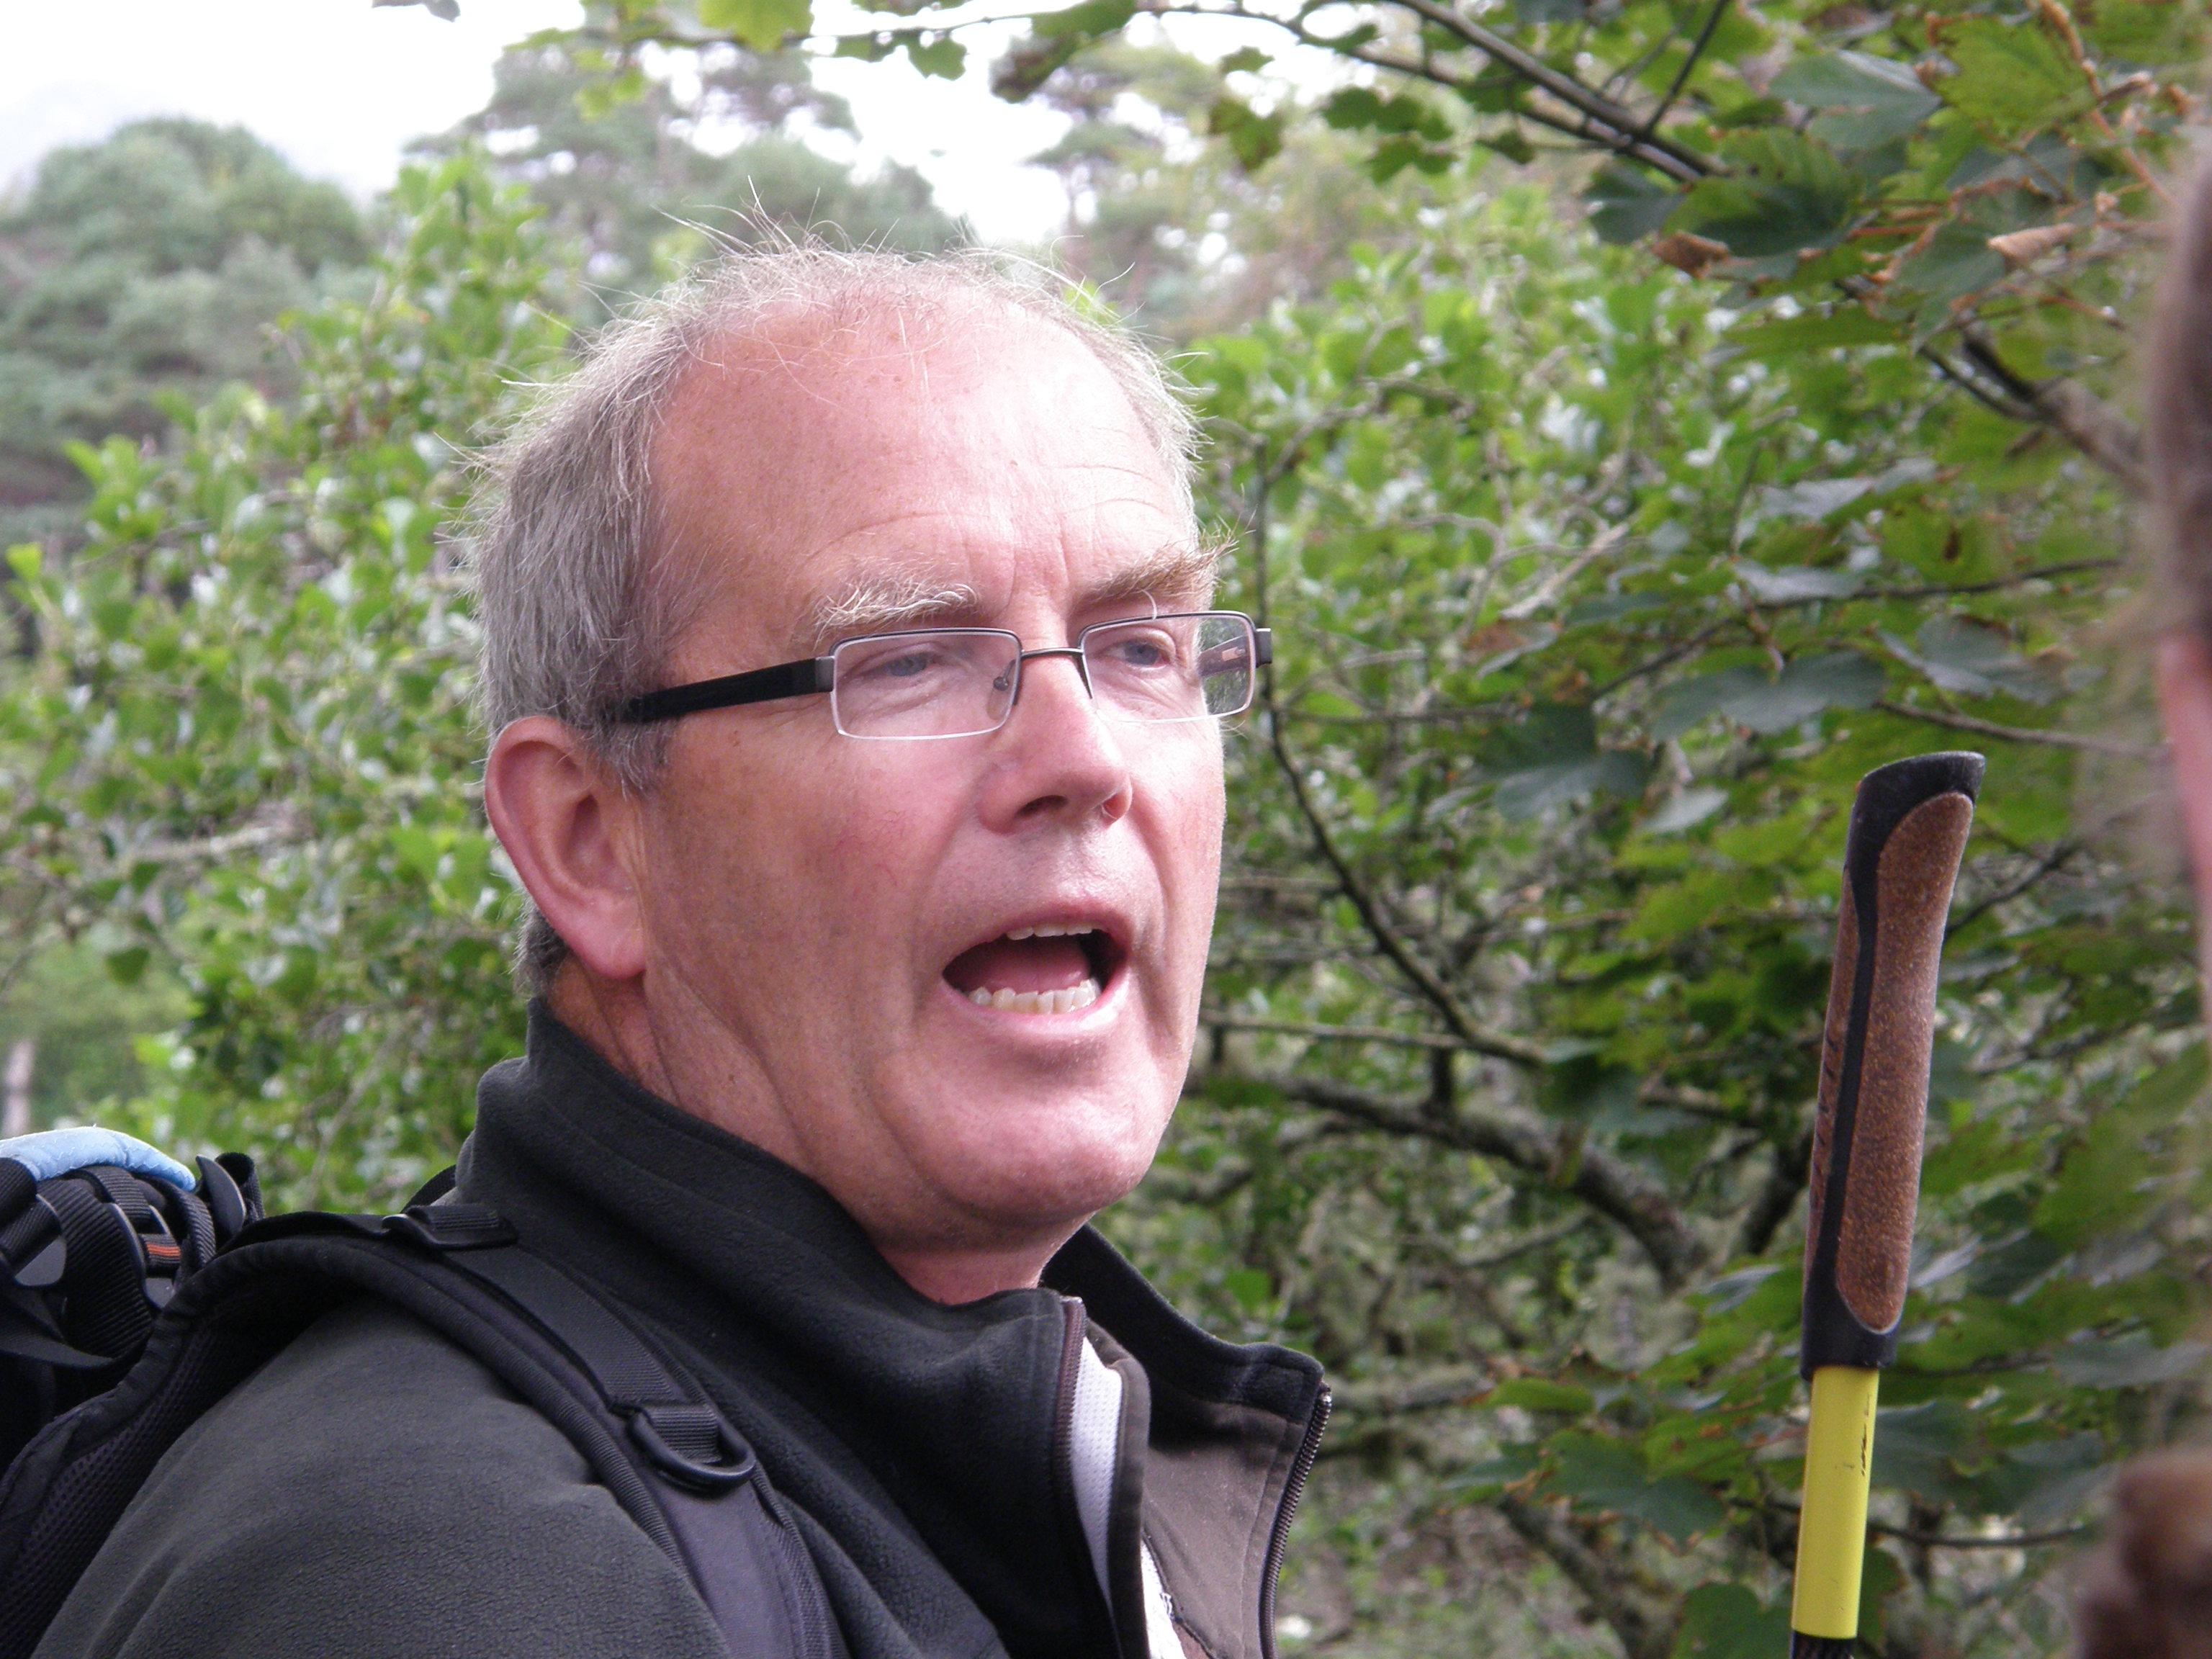 Michael Gibbons, Irish Archeologist and Historian